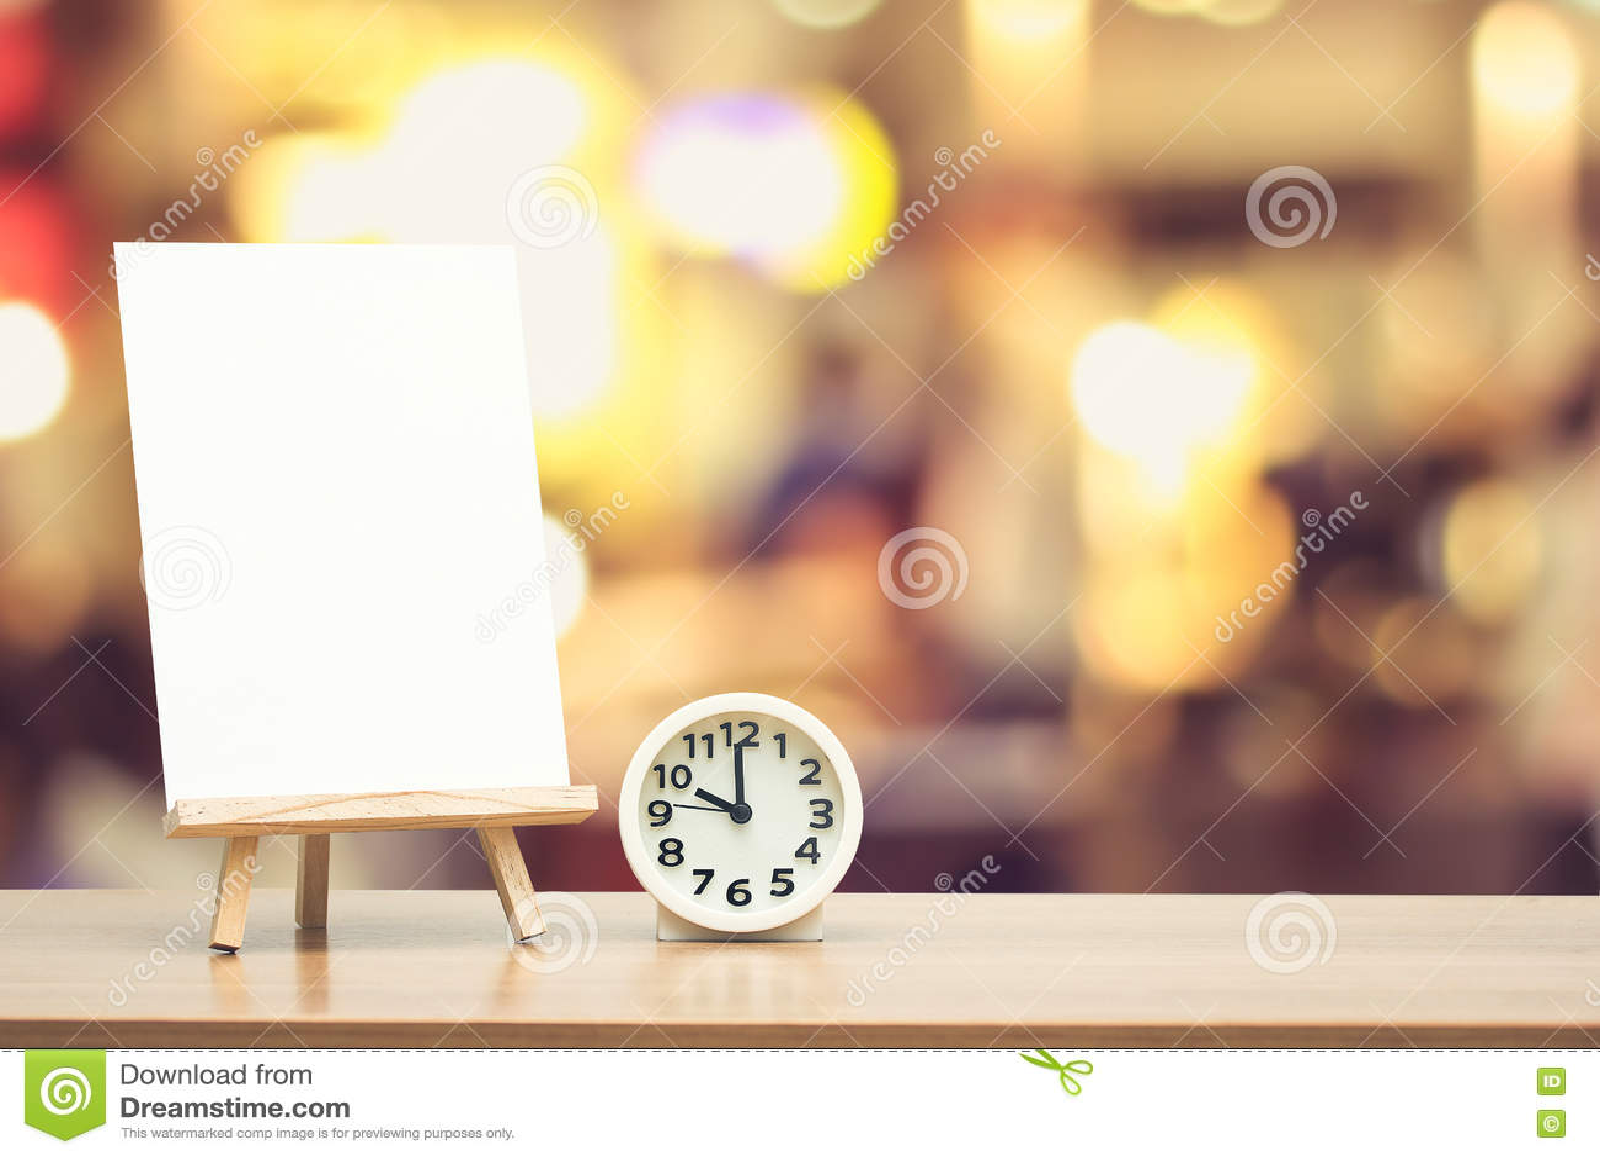 Art easel stock image. Image of blur, display, message - 79748827